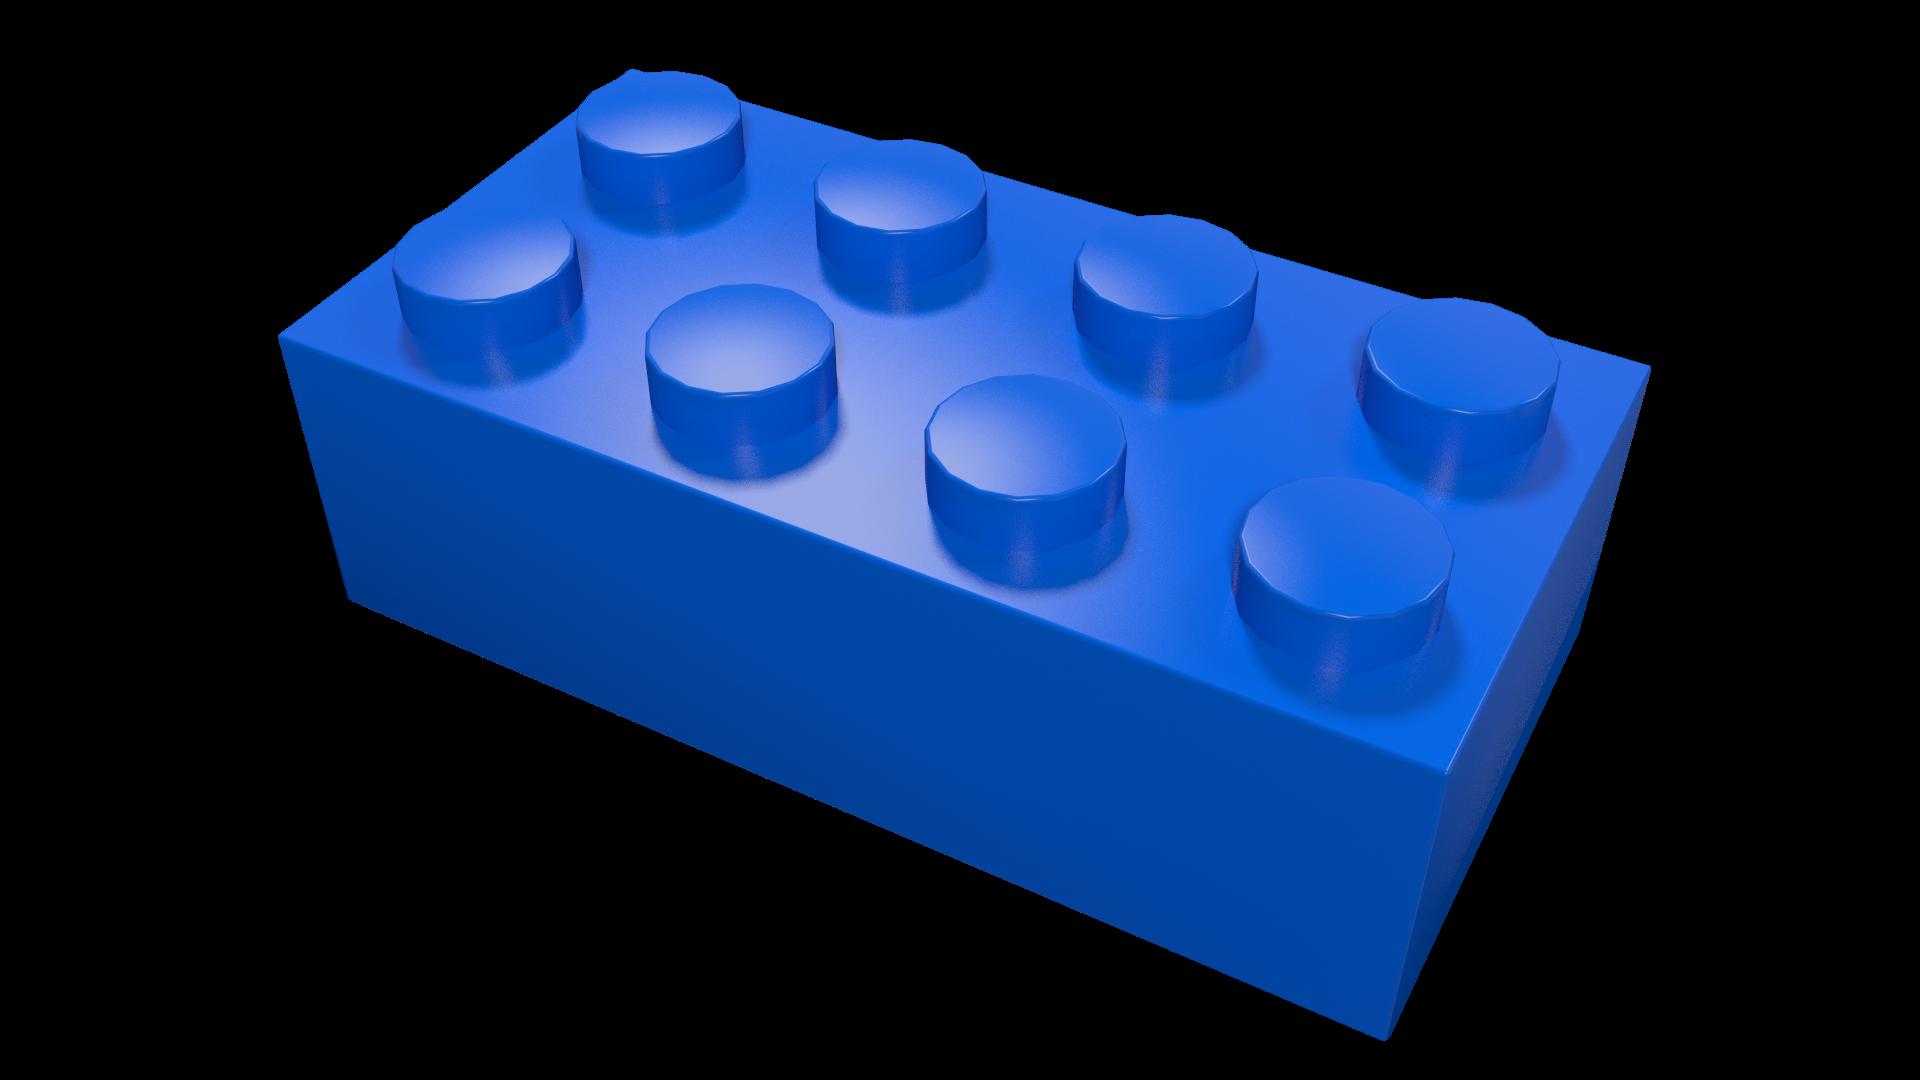 1920x1080 Lego Clipart Transparent